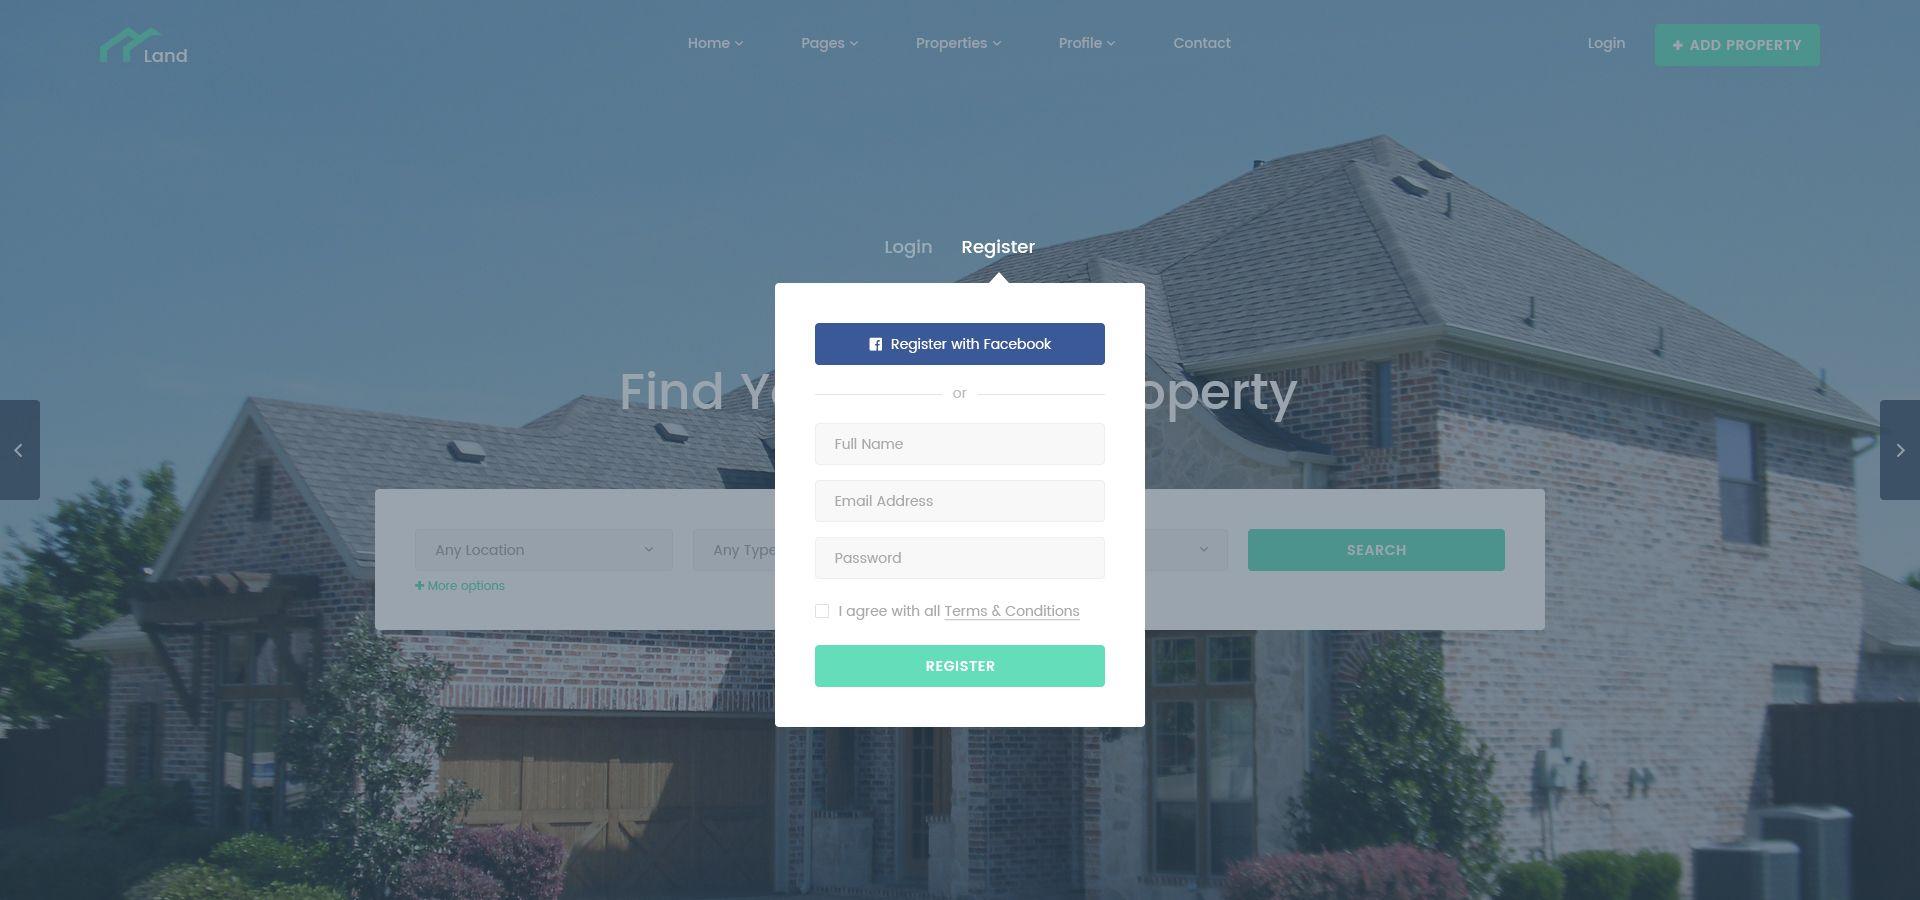 Land Real Estate Property Listing Psd Template Estate Amp